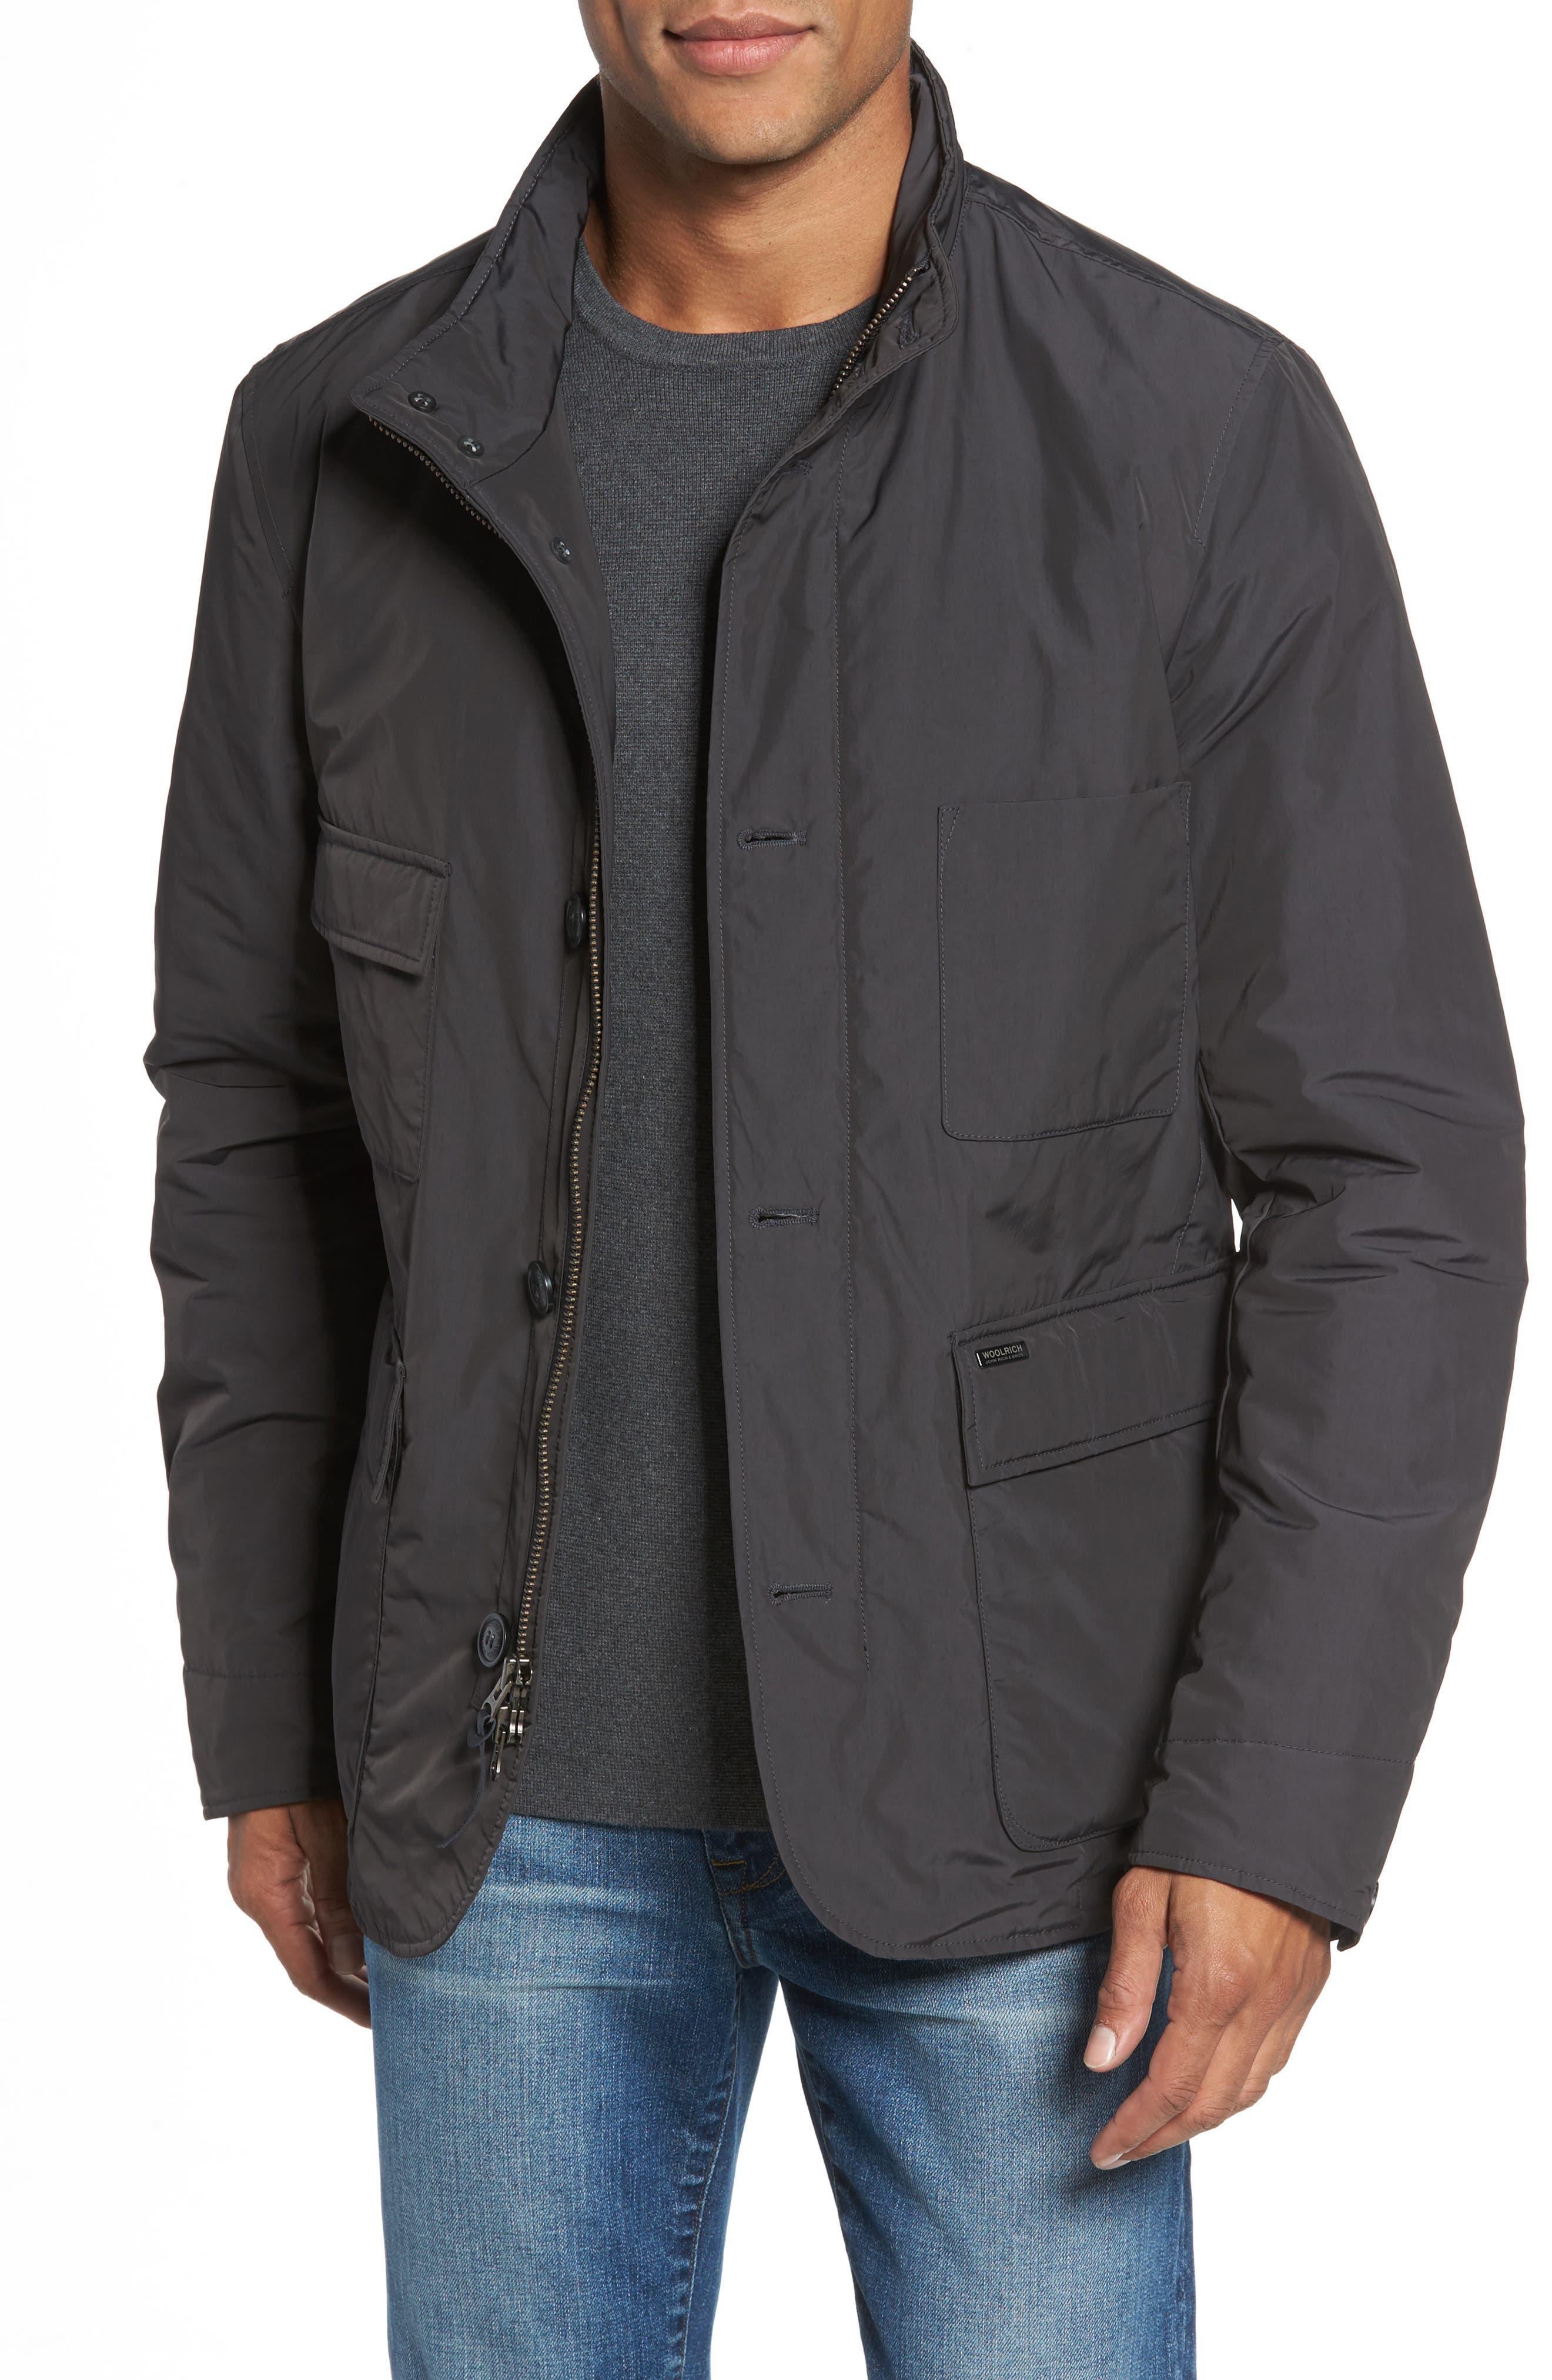 John Rich & Bros. Turner Jacket,                         Main,                         color, 013